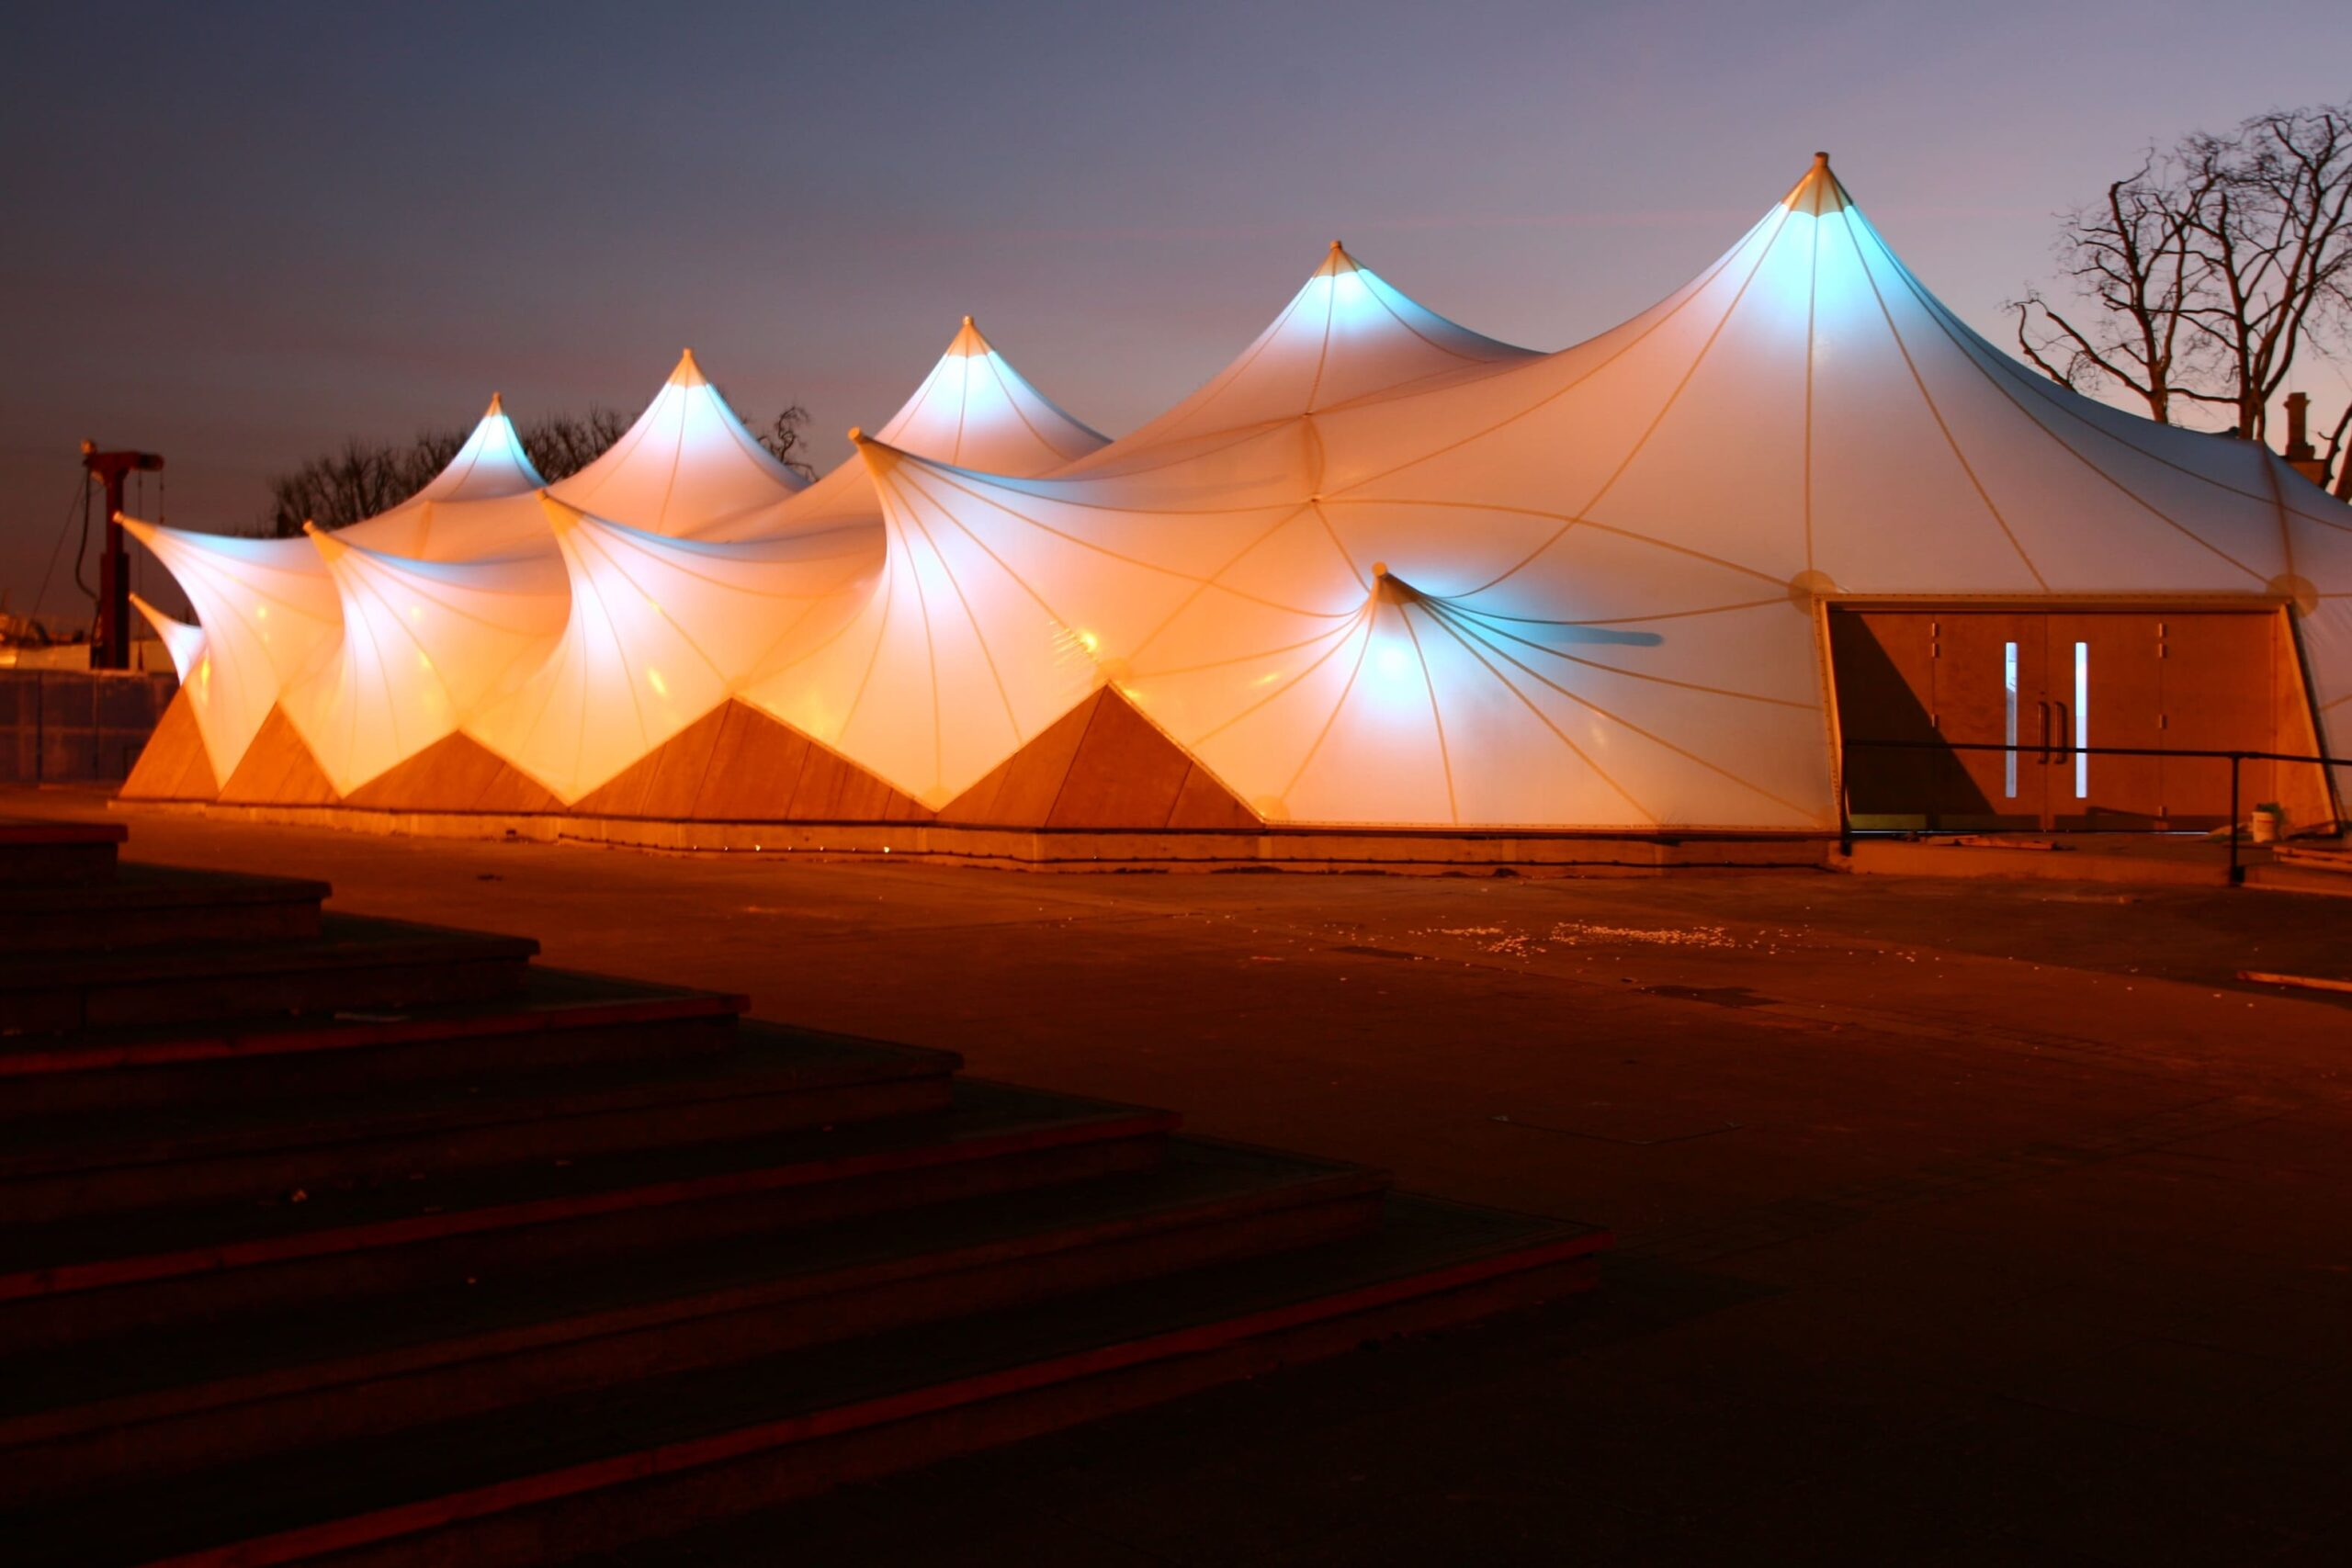 Cutty Sark Pavilion